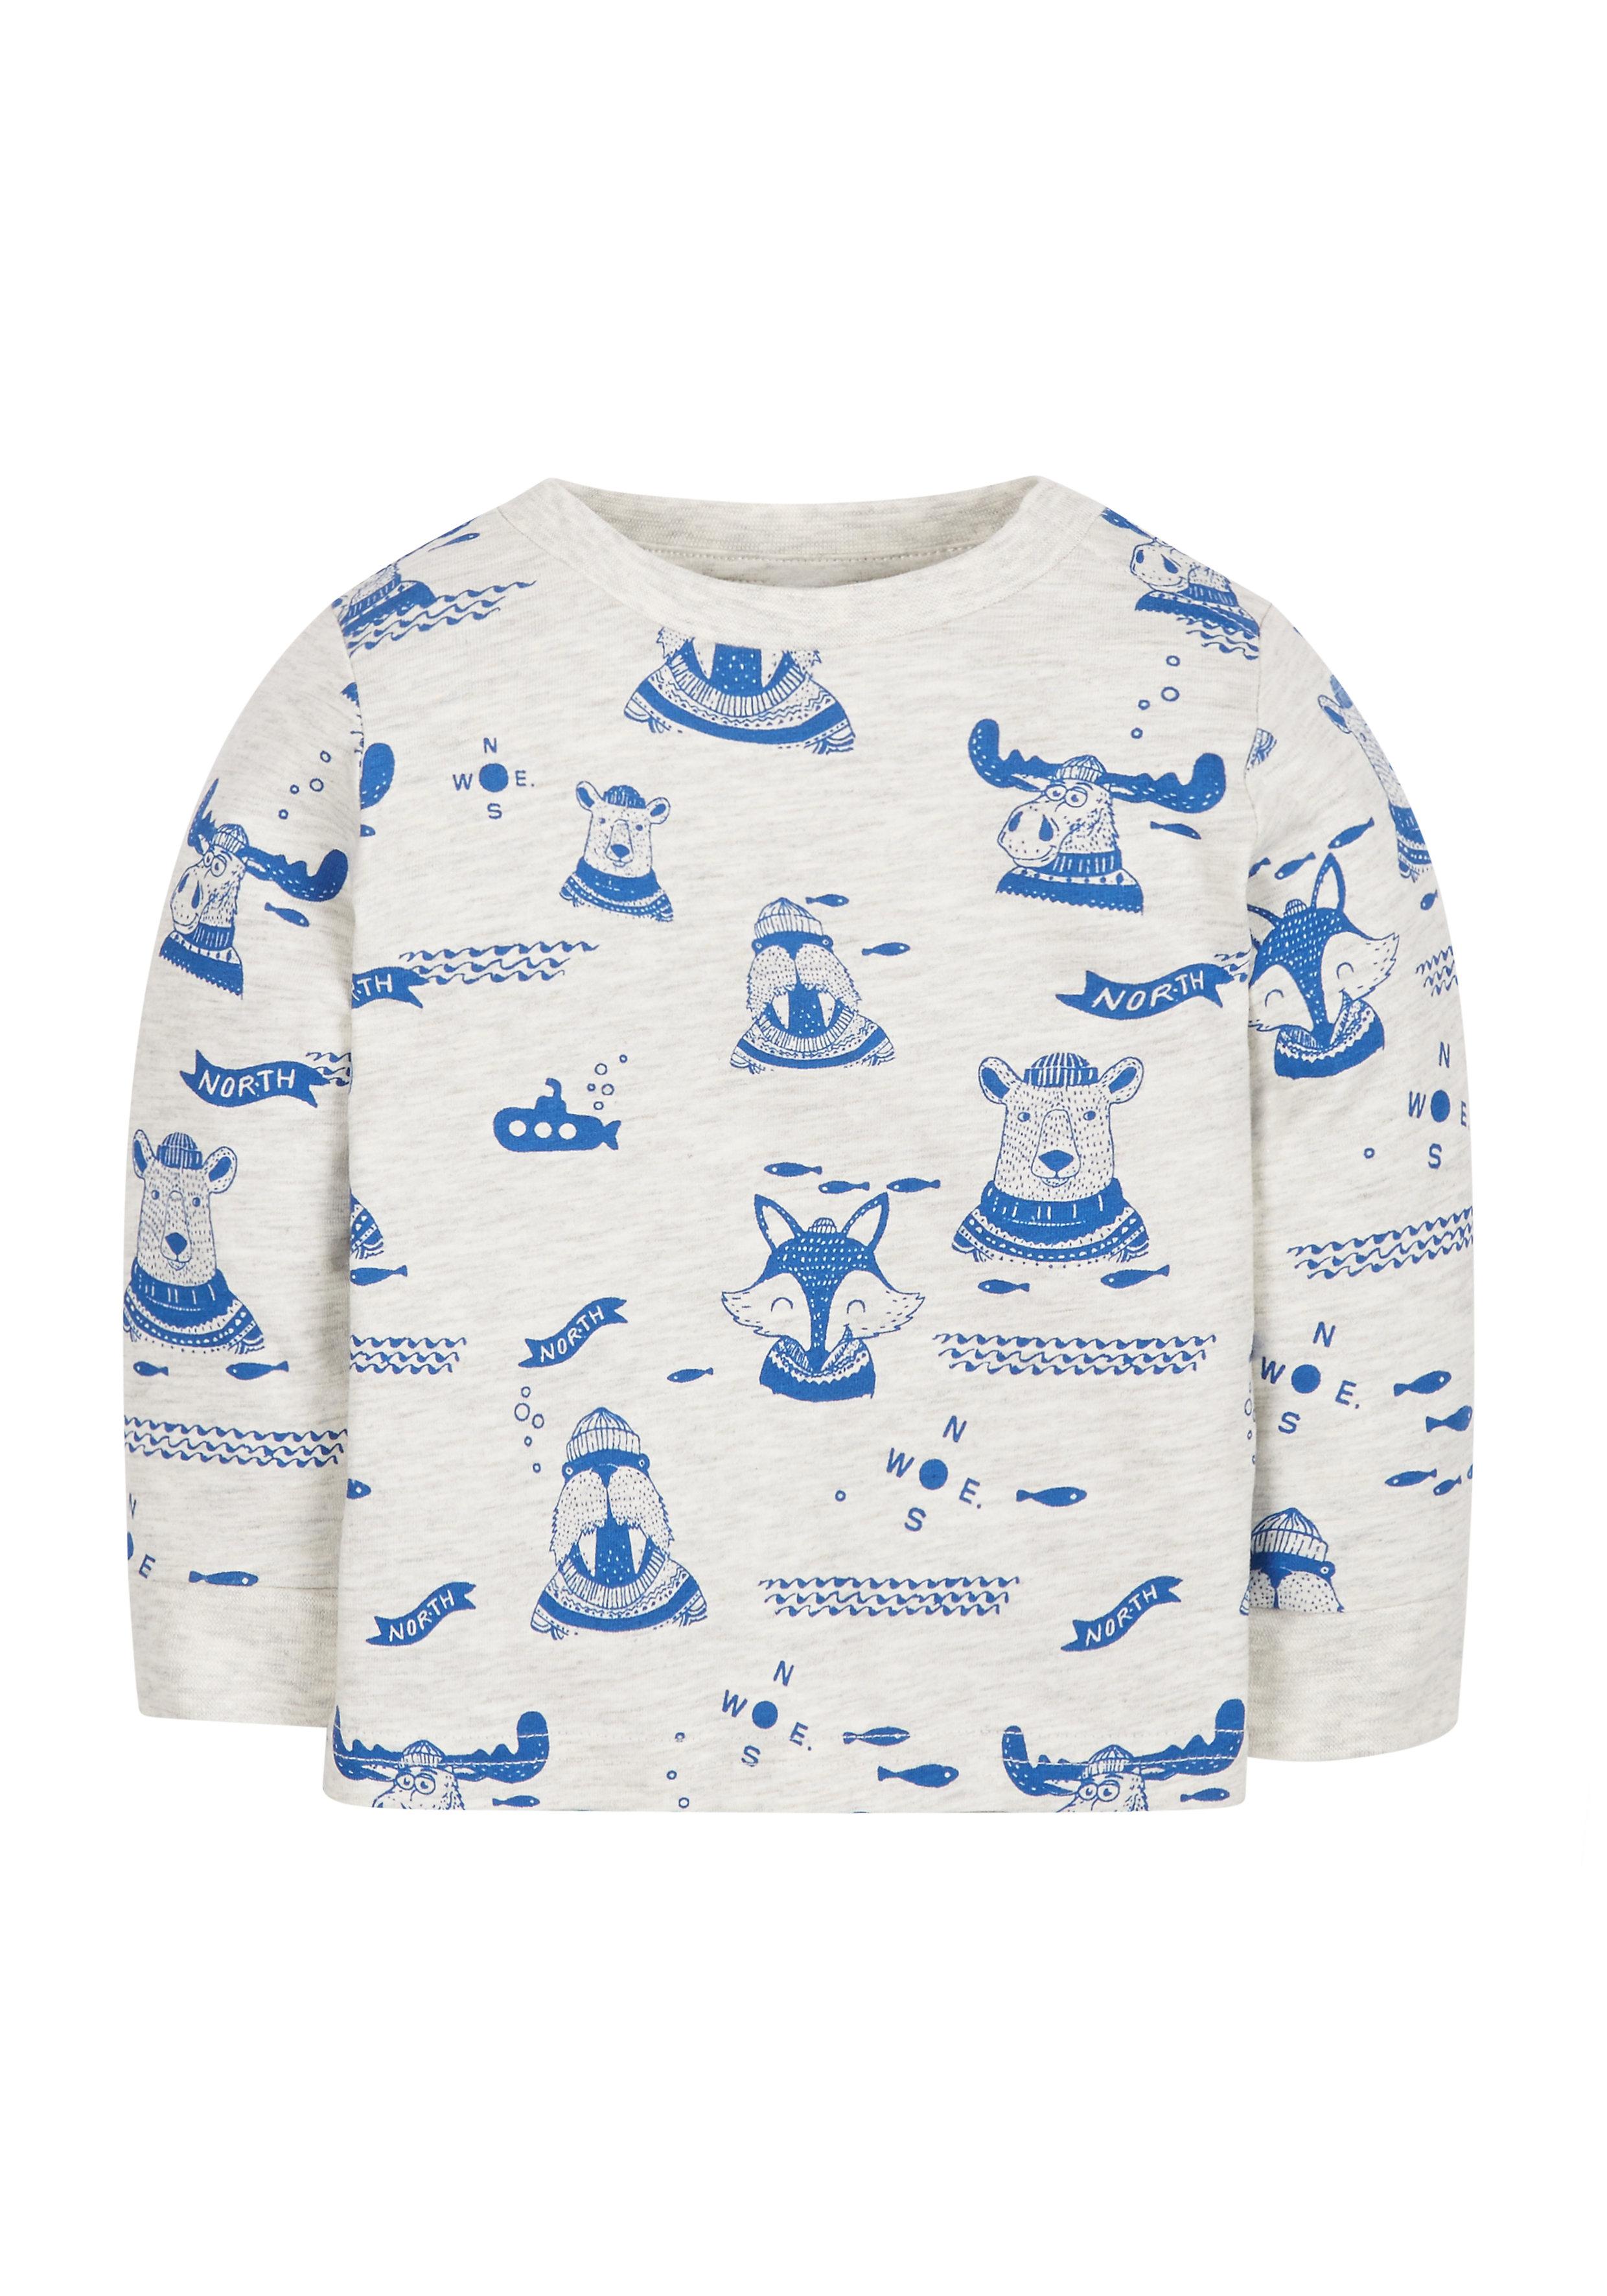 Mothercare   Boys Arctic Animal Print T-Shirt - Beige